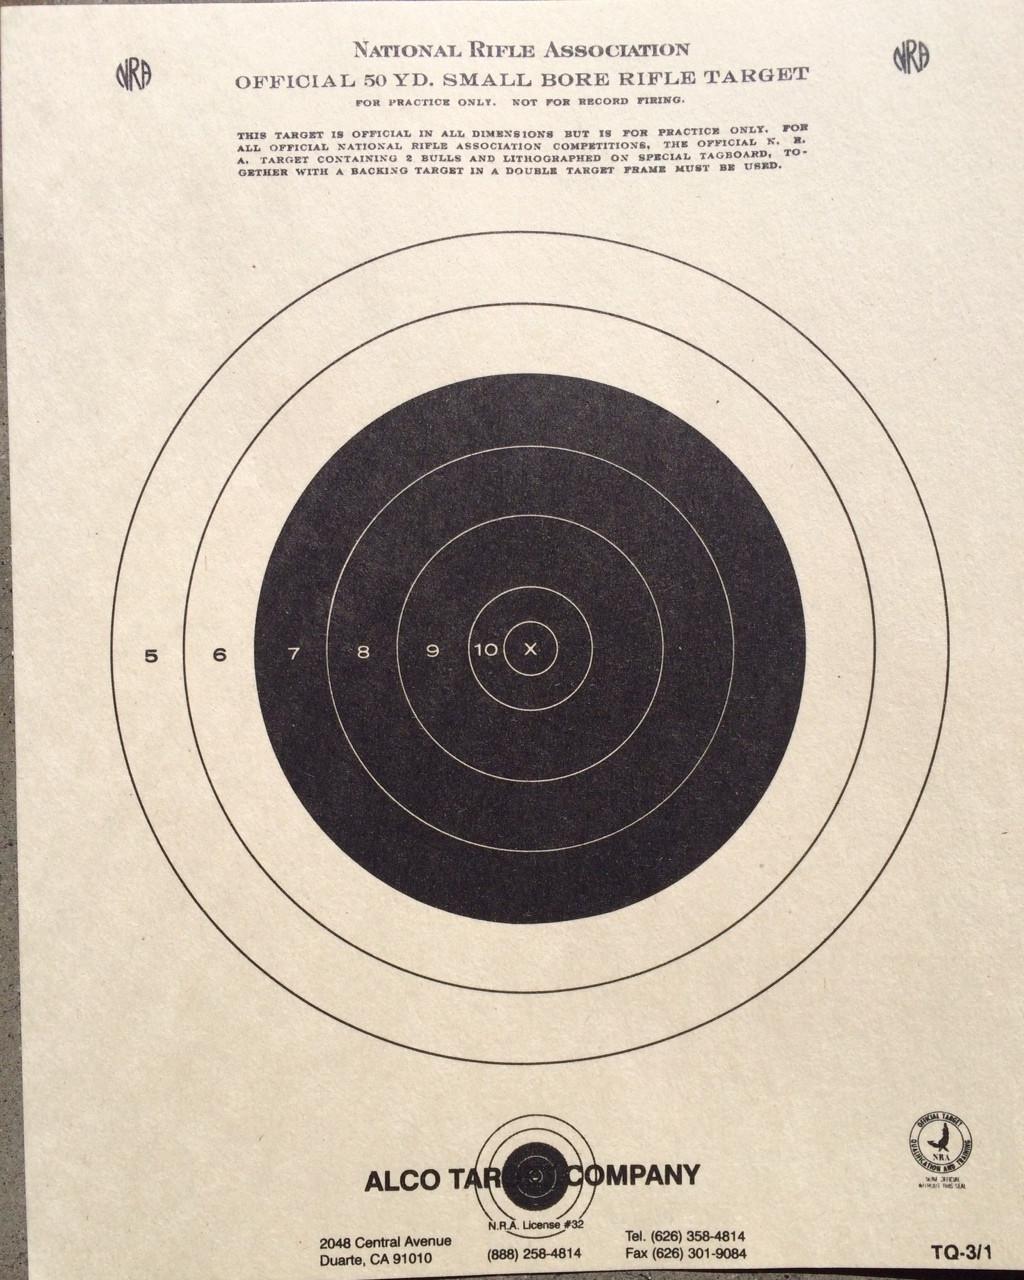 TQ-3/1 Shooting Target